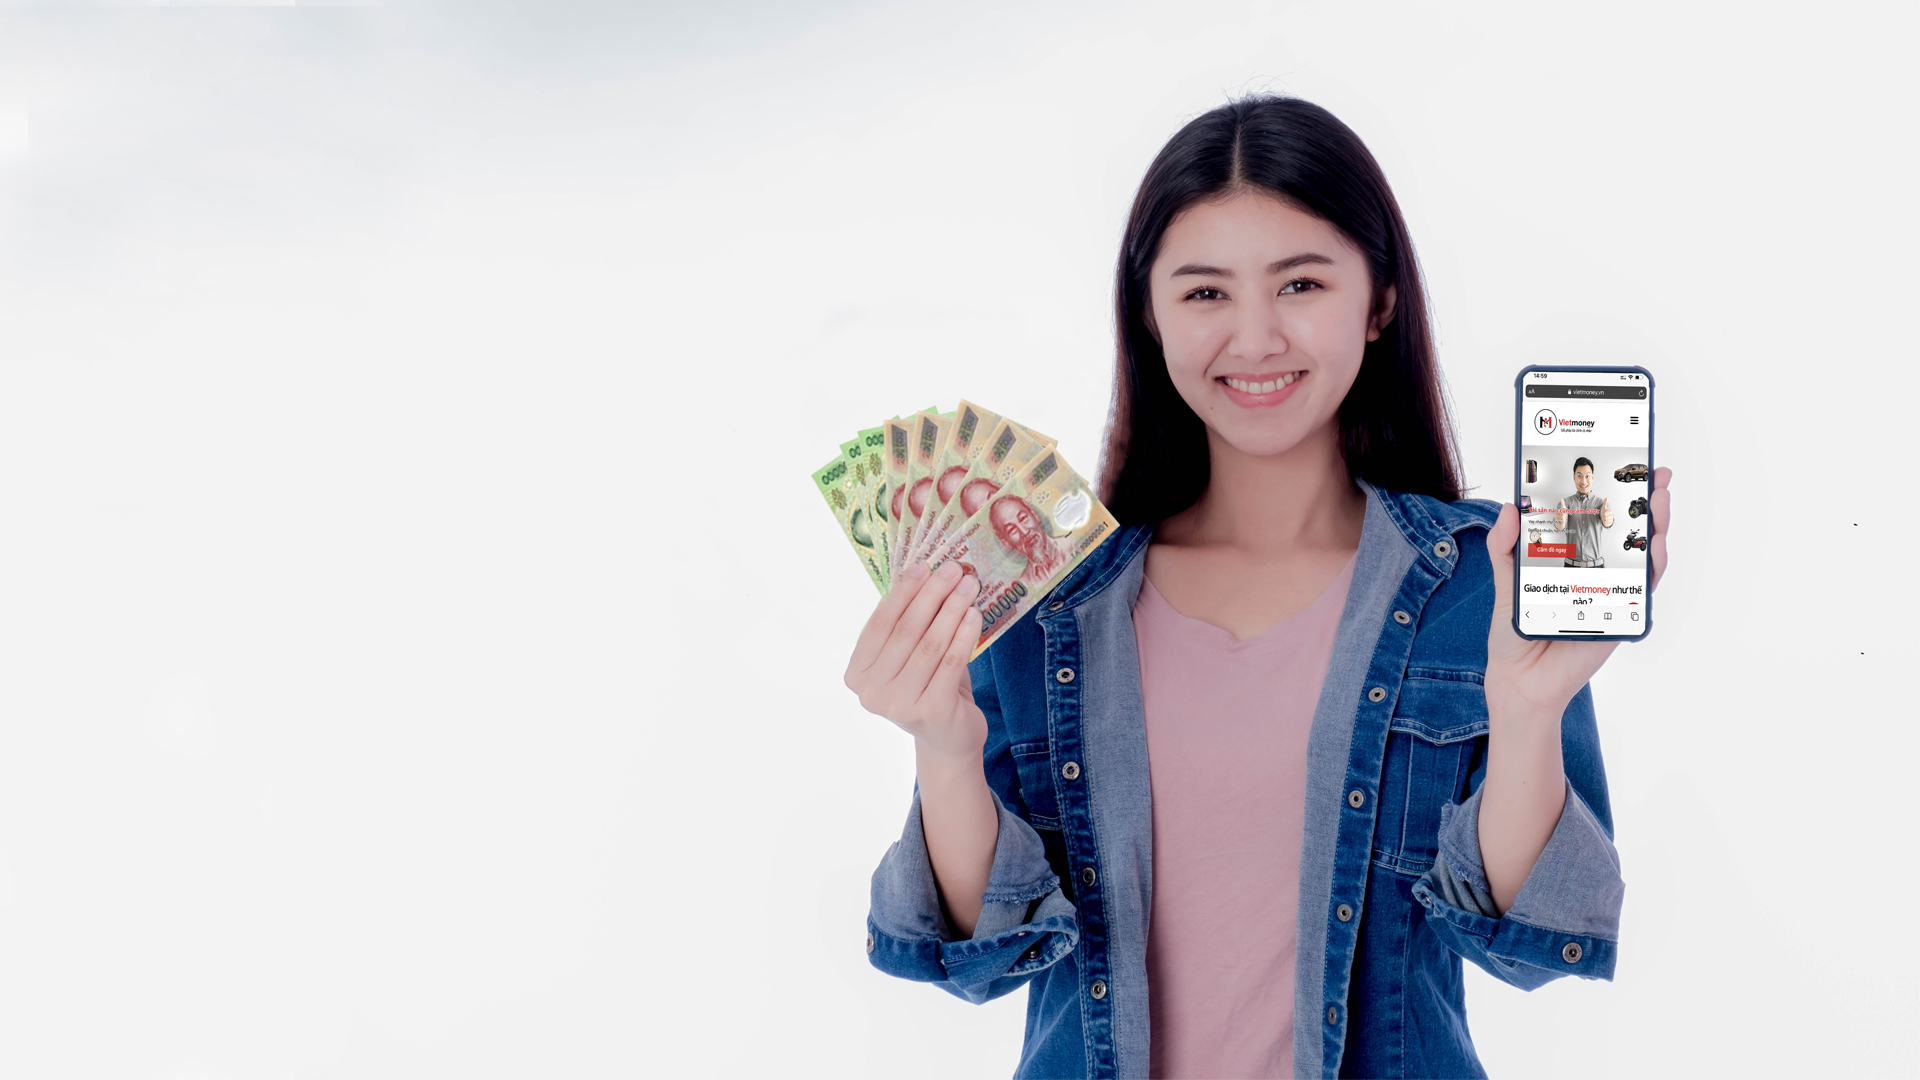 cầm đồ online nhận tiền sau 30 phút